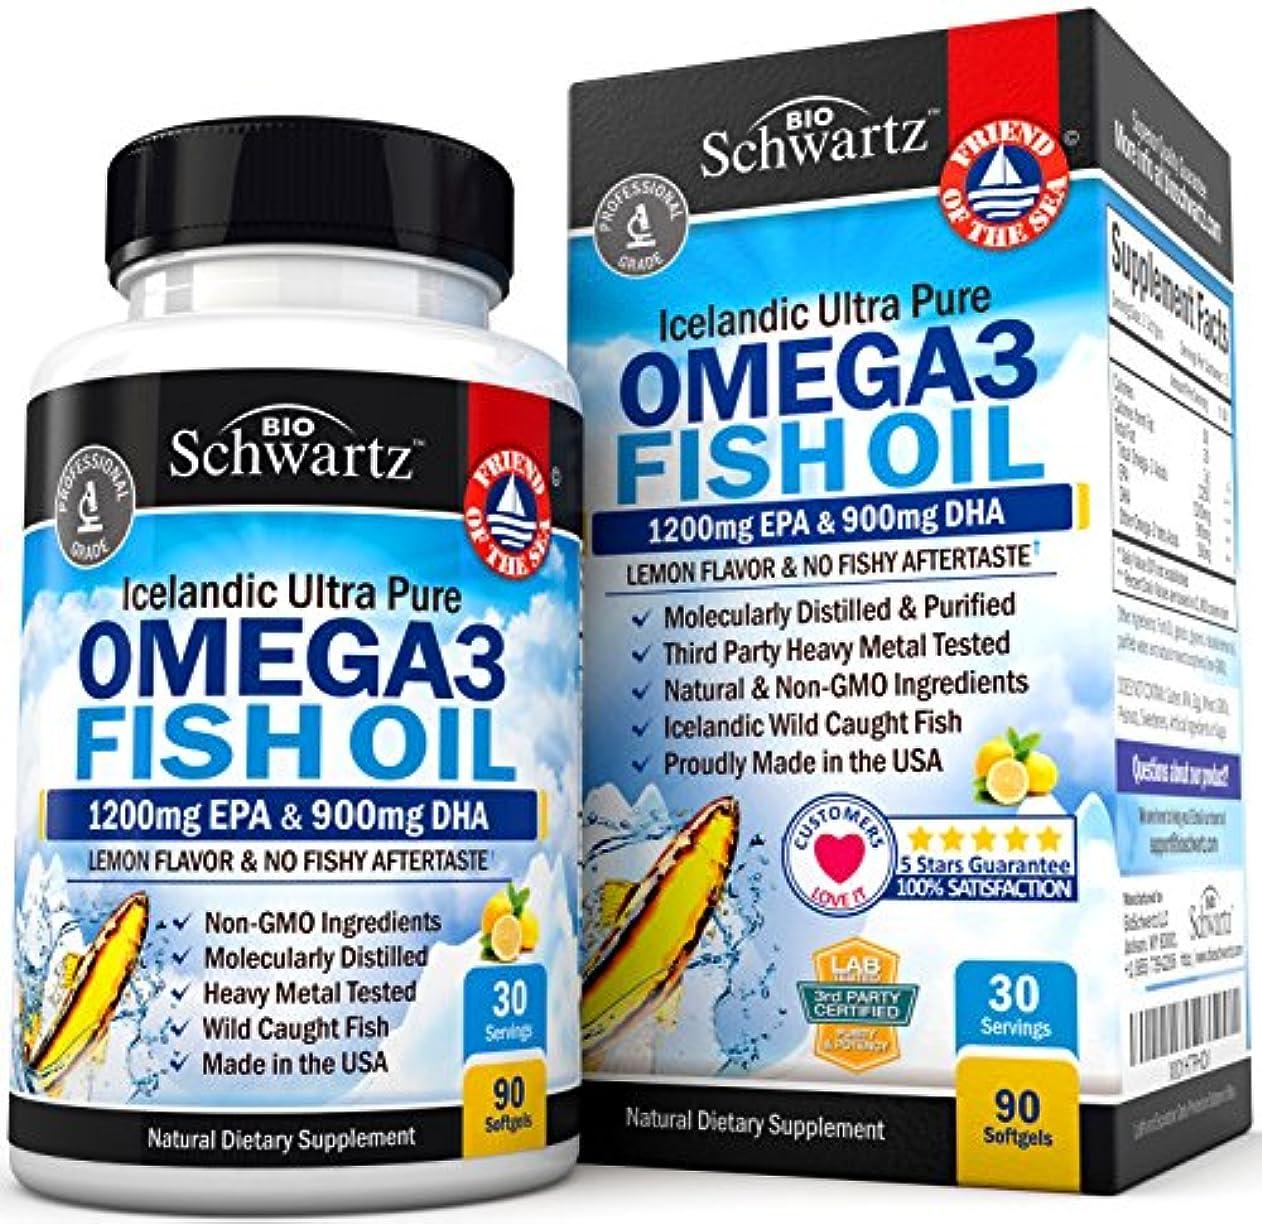 BioSchwartz Omega 3 Fish Oil Supplement with 1200mg EPA, 900mg DHA 90粒